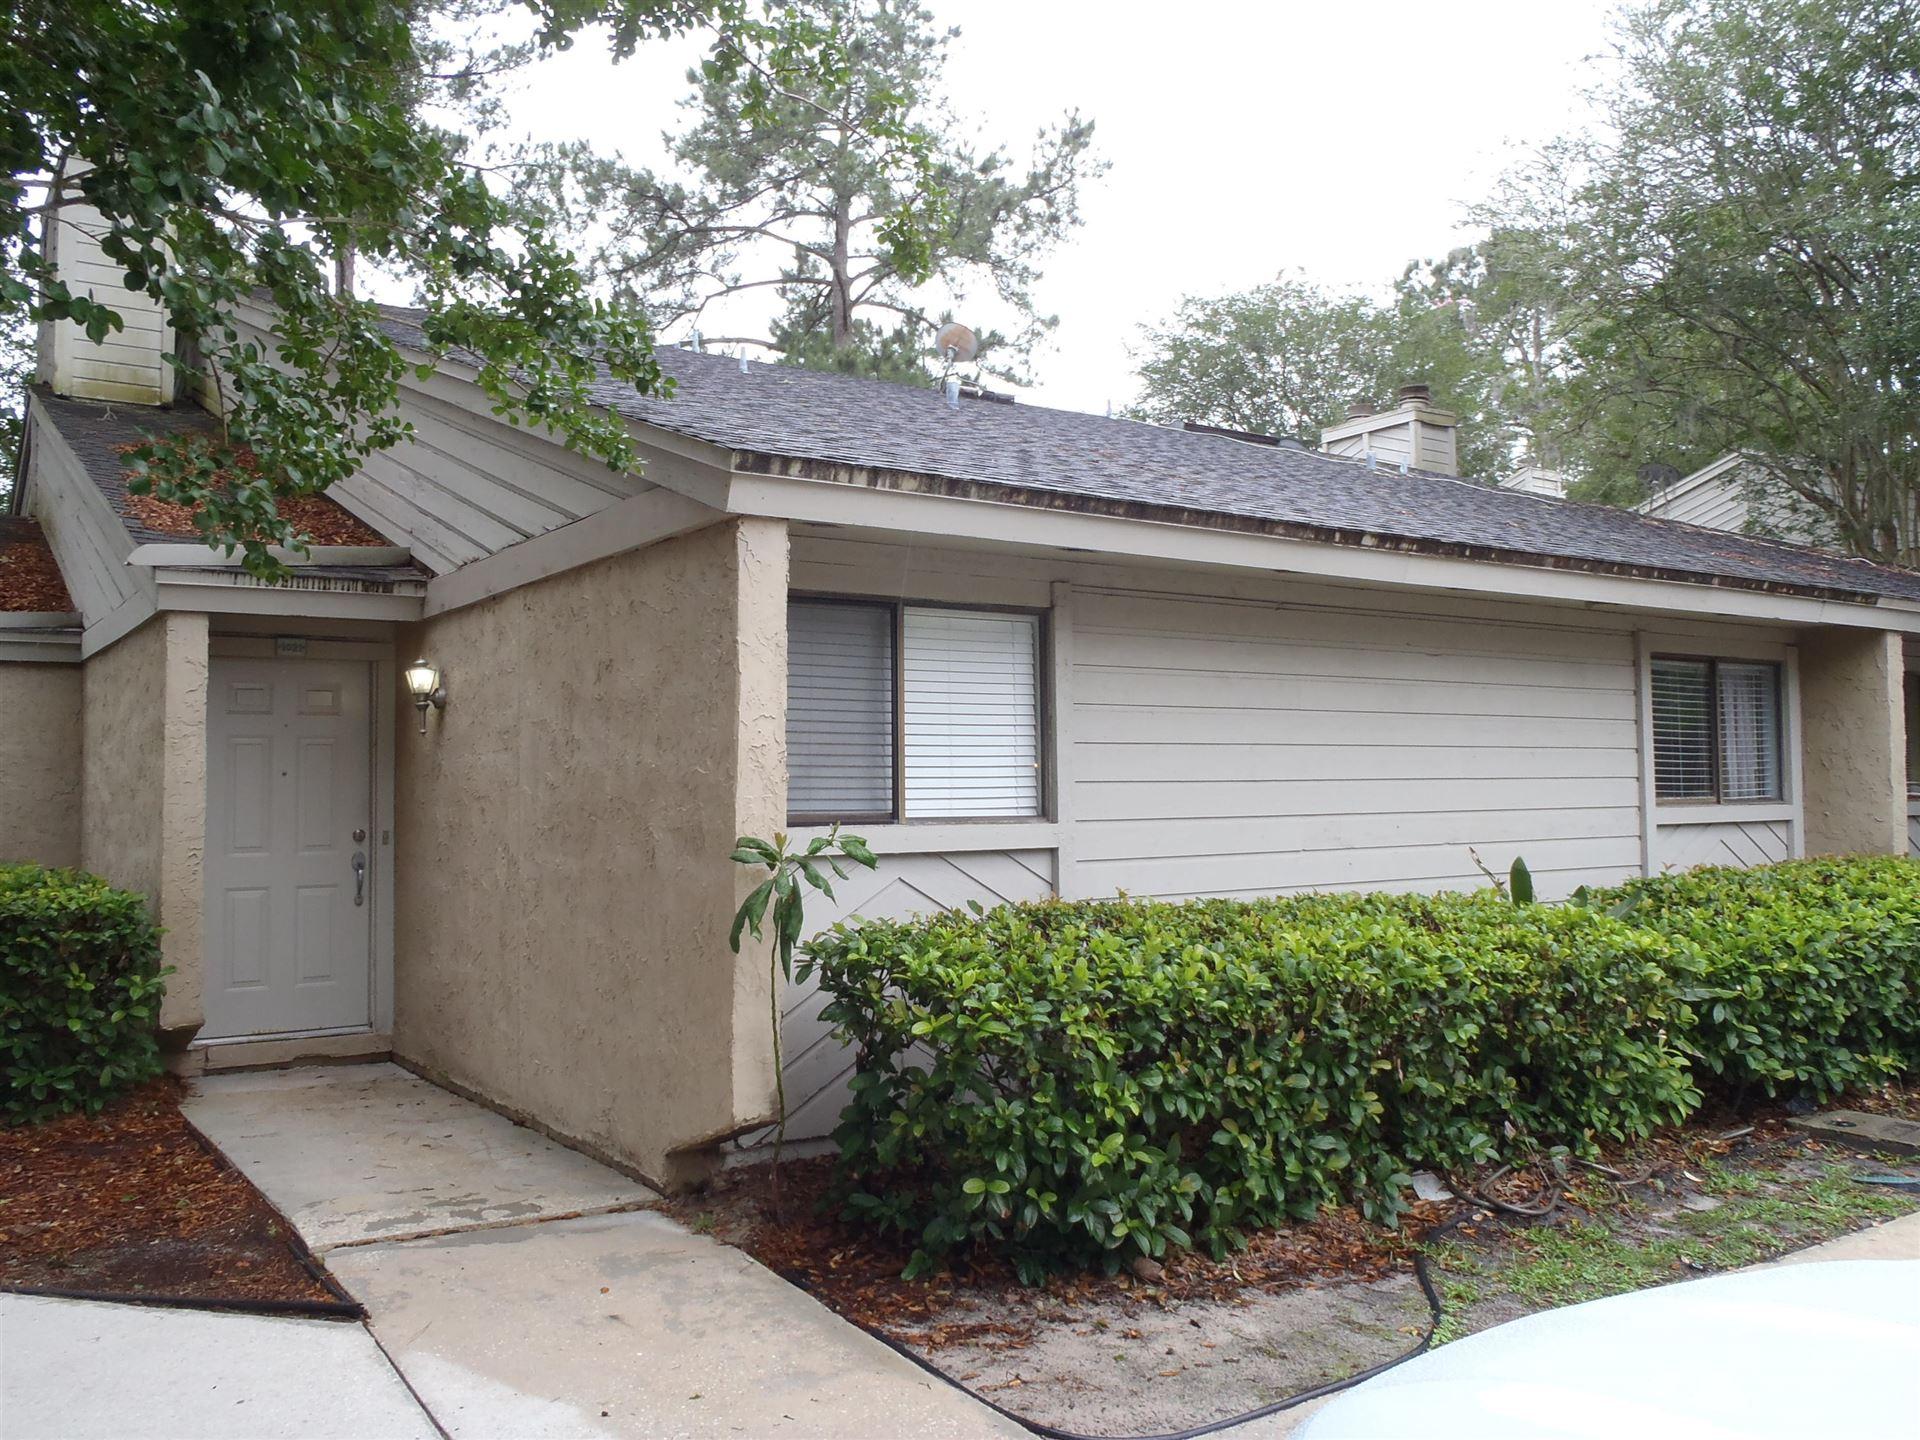 3801 CROWN POINT RD, Jacksonville, FL 32257 - MLS#: 1109894